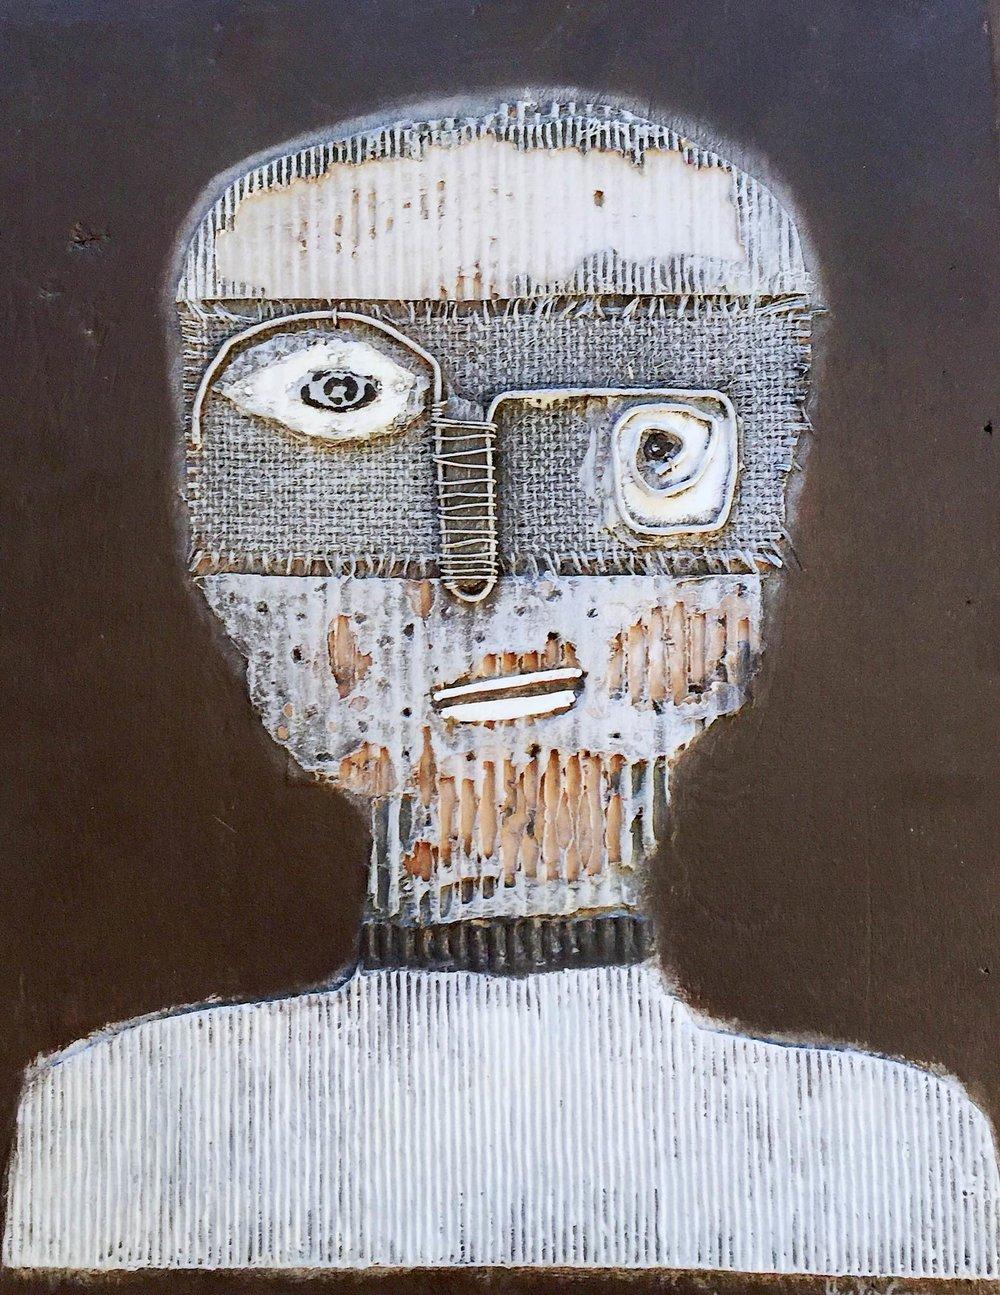 bryant-toth-fine-art-hector-frank-exhibition-11.jpg